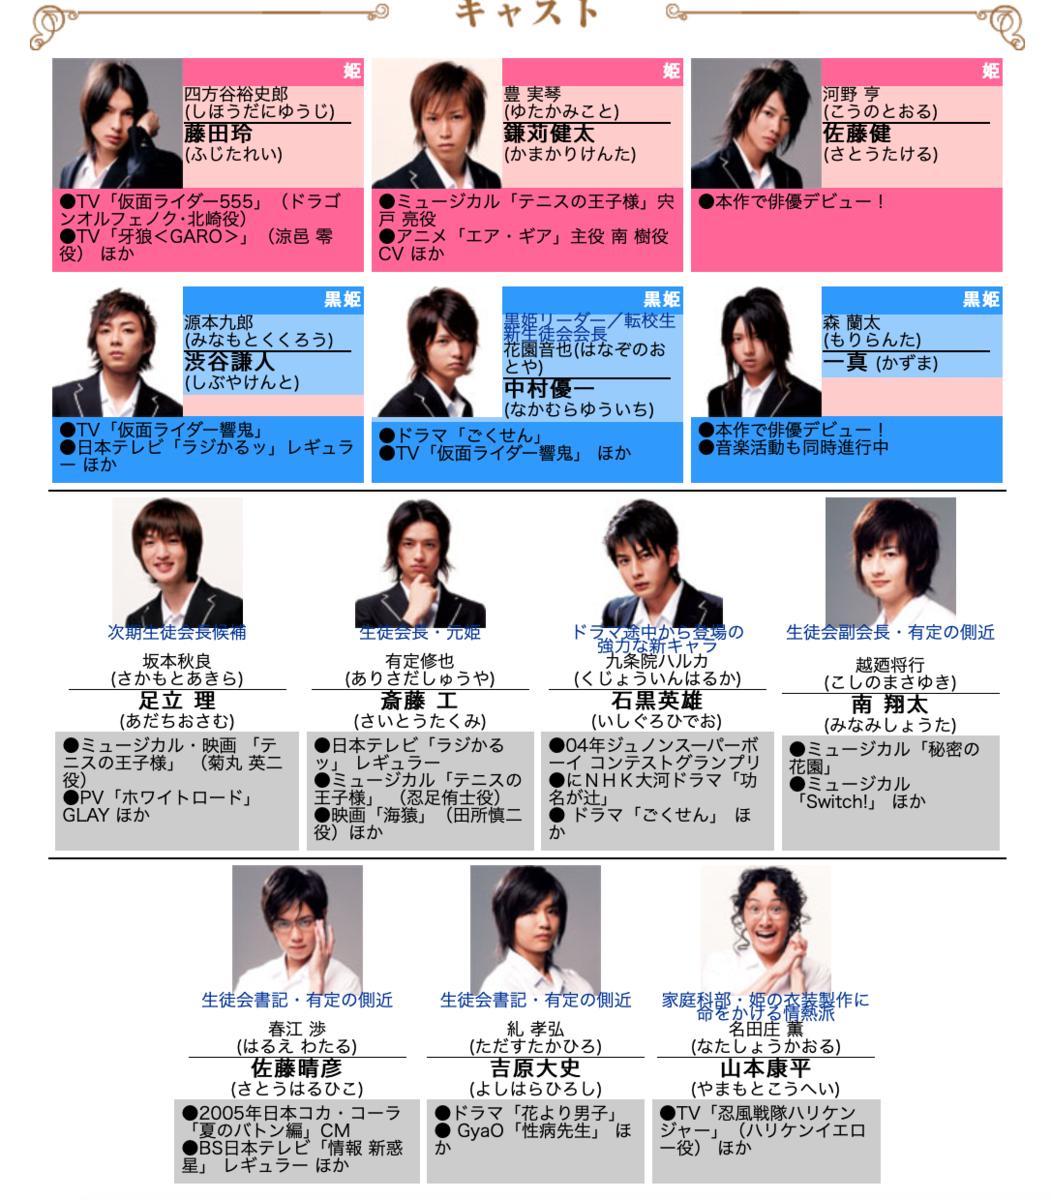 f:id:yukamitsu44:20200506150955p:plain